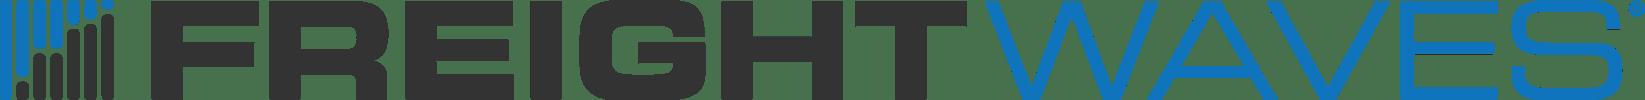 01-freightwaves-logo